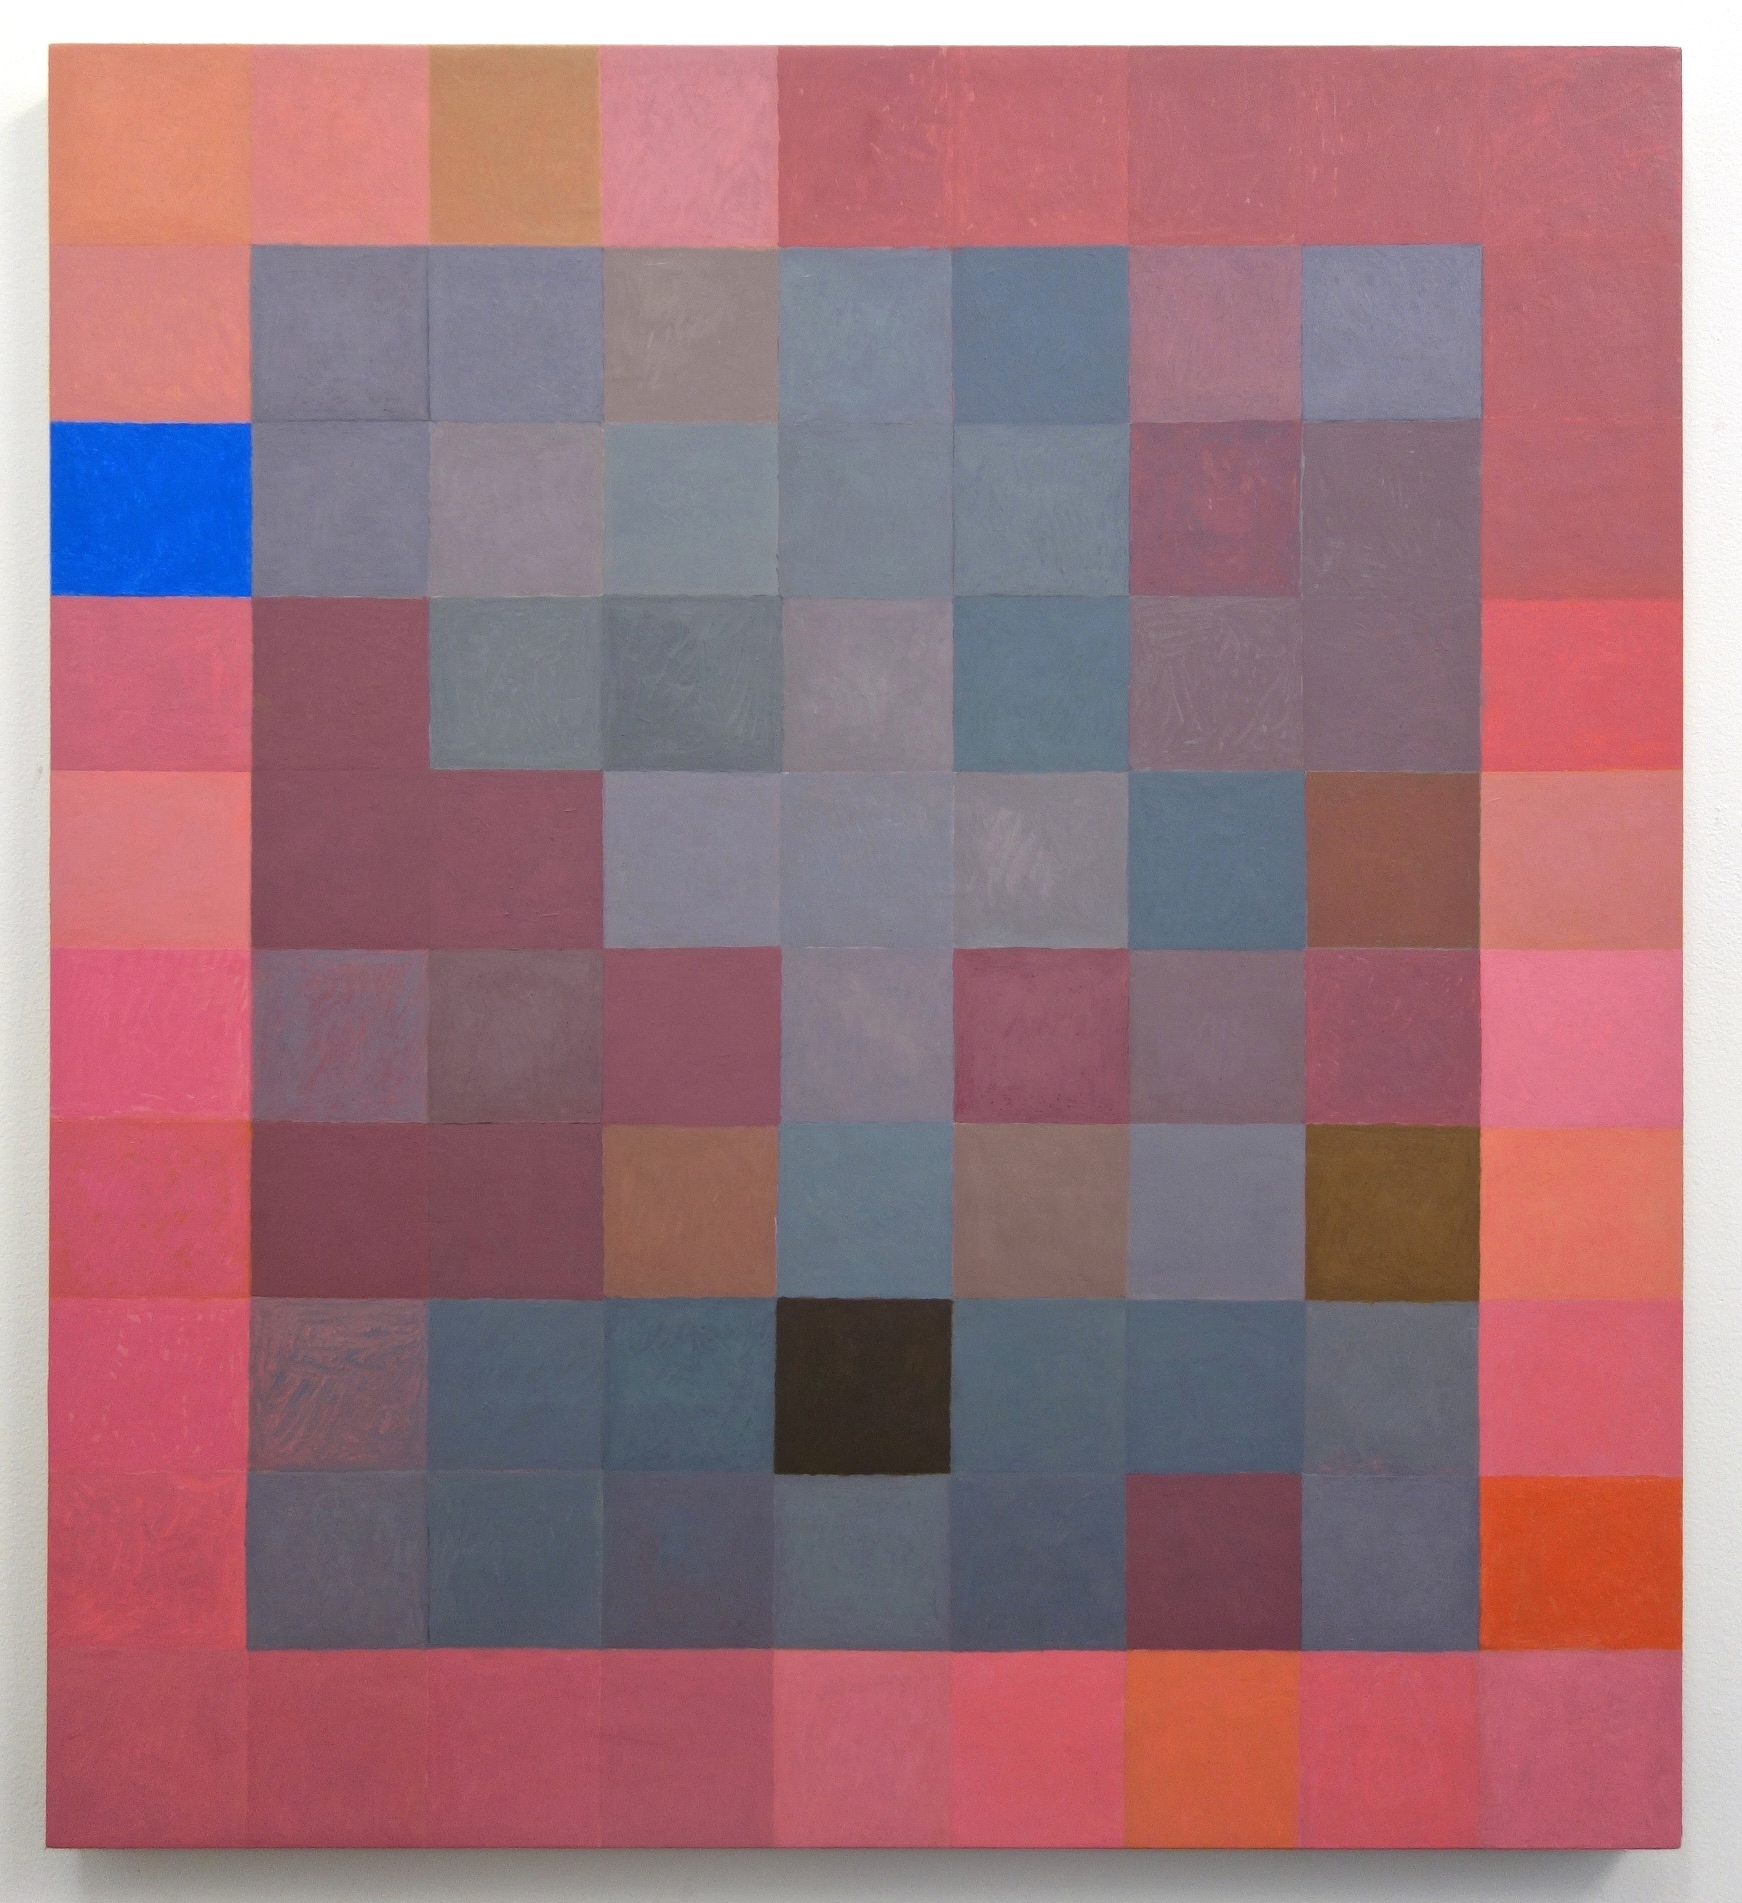 "Foggy Grid, 2015. Oil on Linen. 36"" x 32 5/8"""